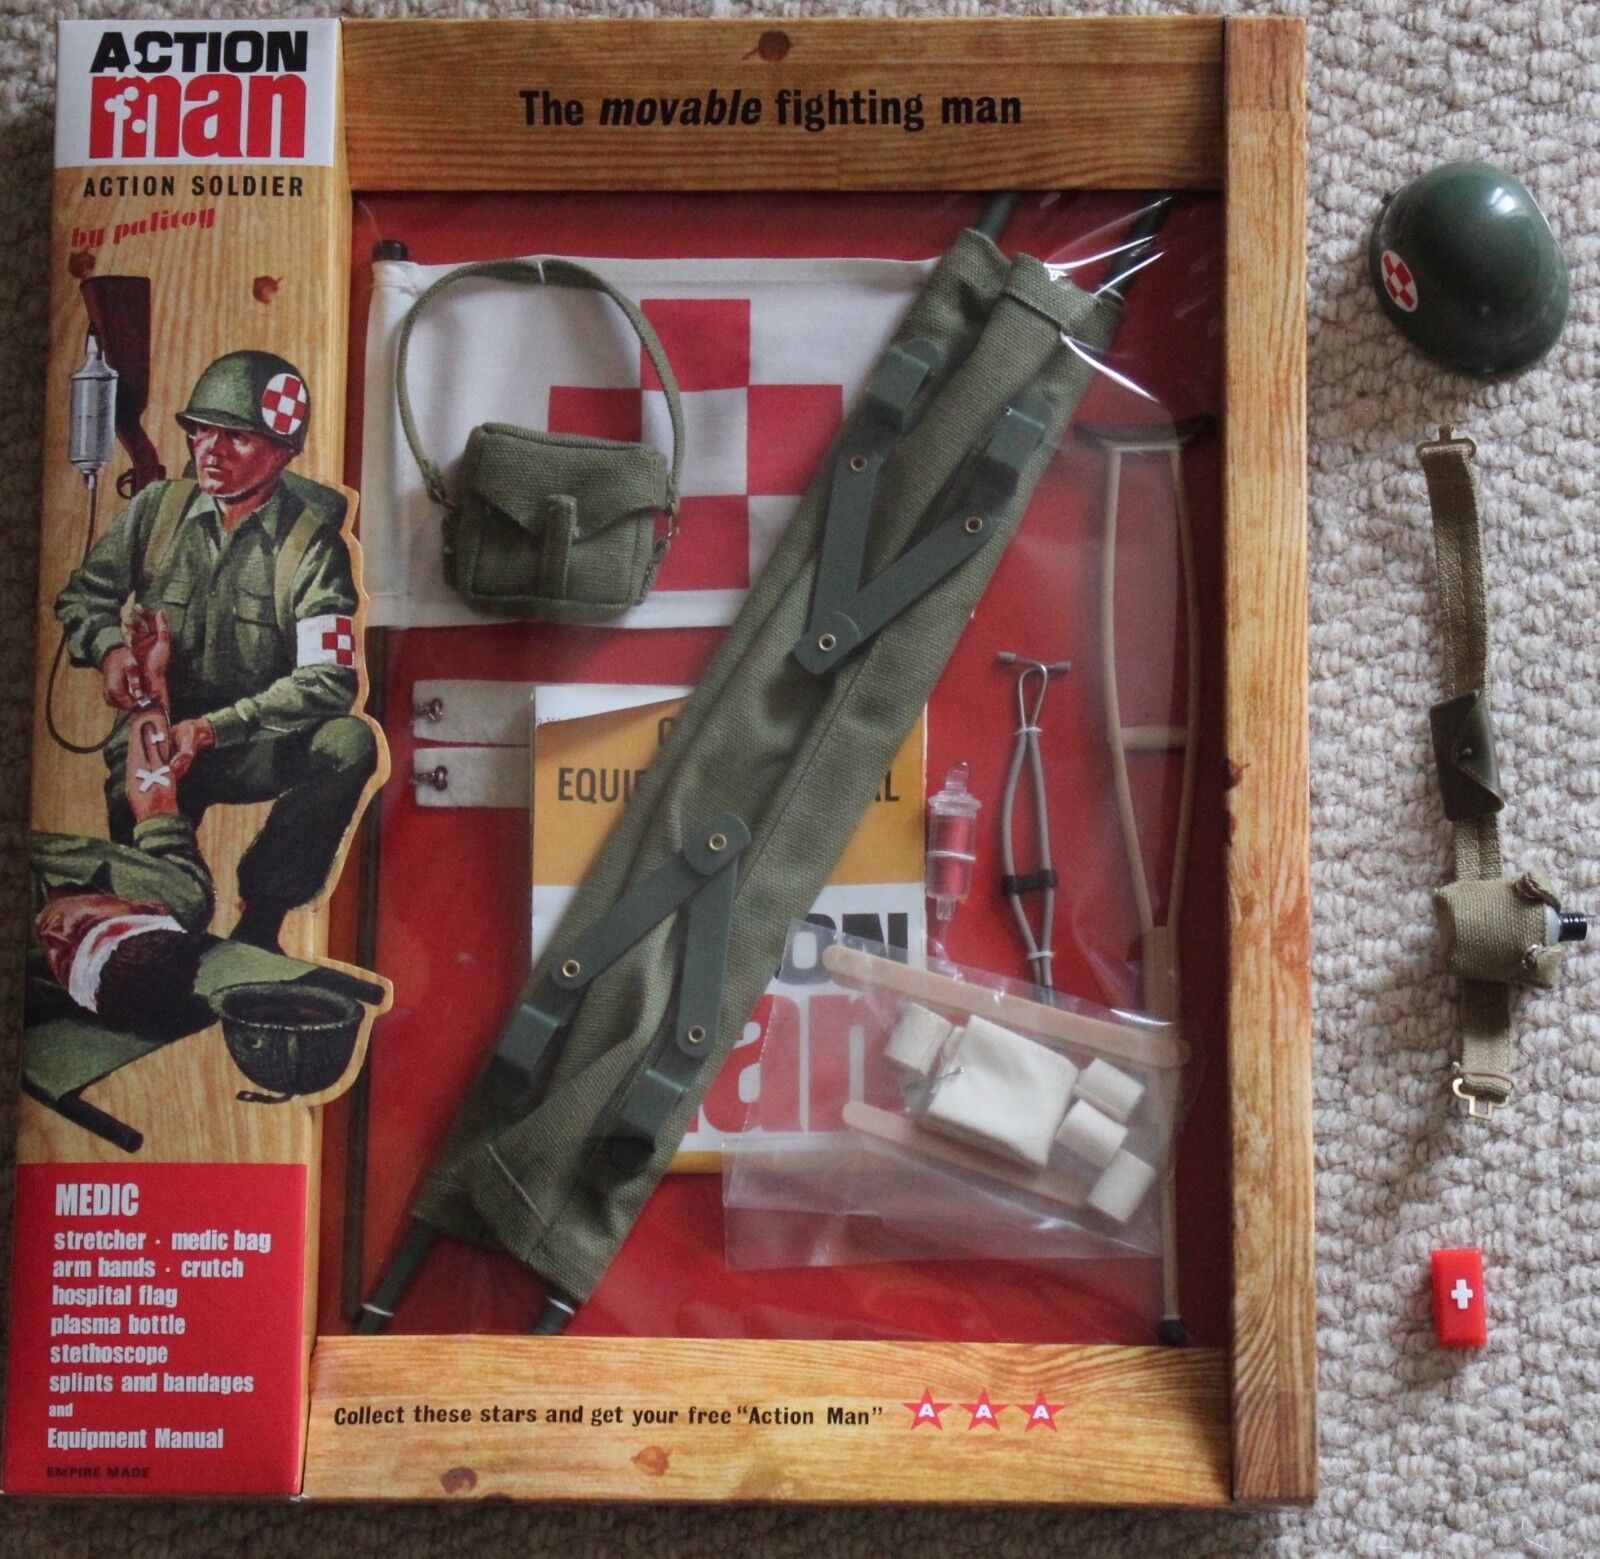 VINTAGE ACTION MAN 40th LOOSE ACTION SOLDIER MEDIC HELMET 1//6 SCALE